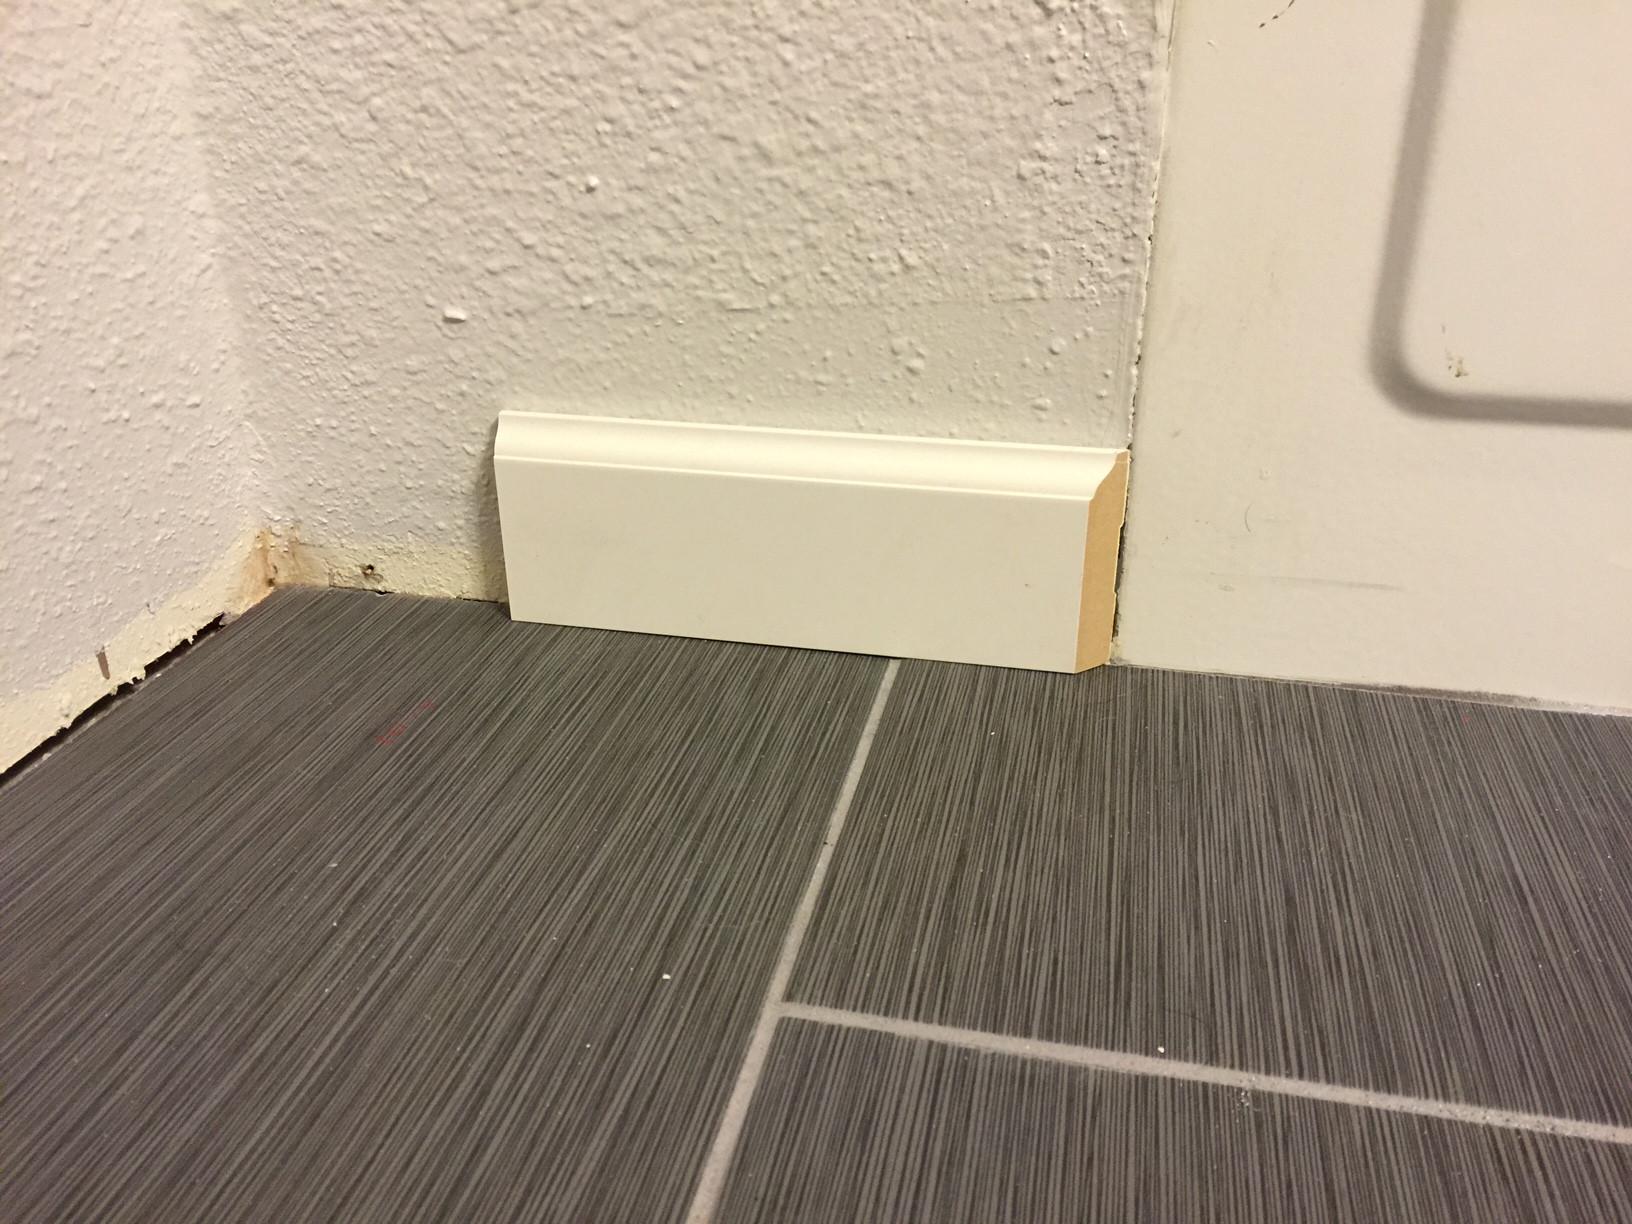 baseboard to a flat bathtub